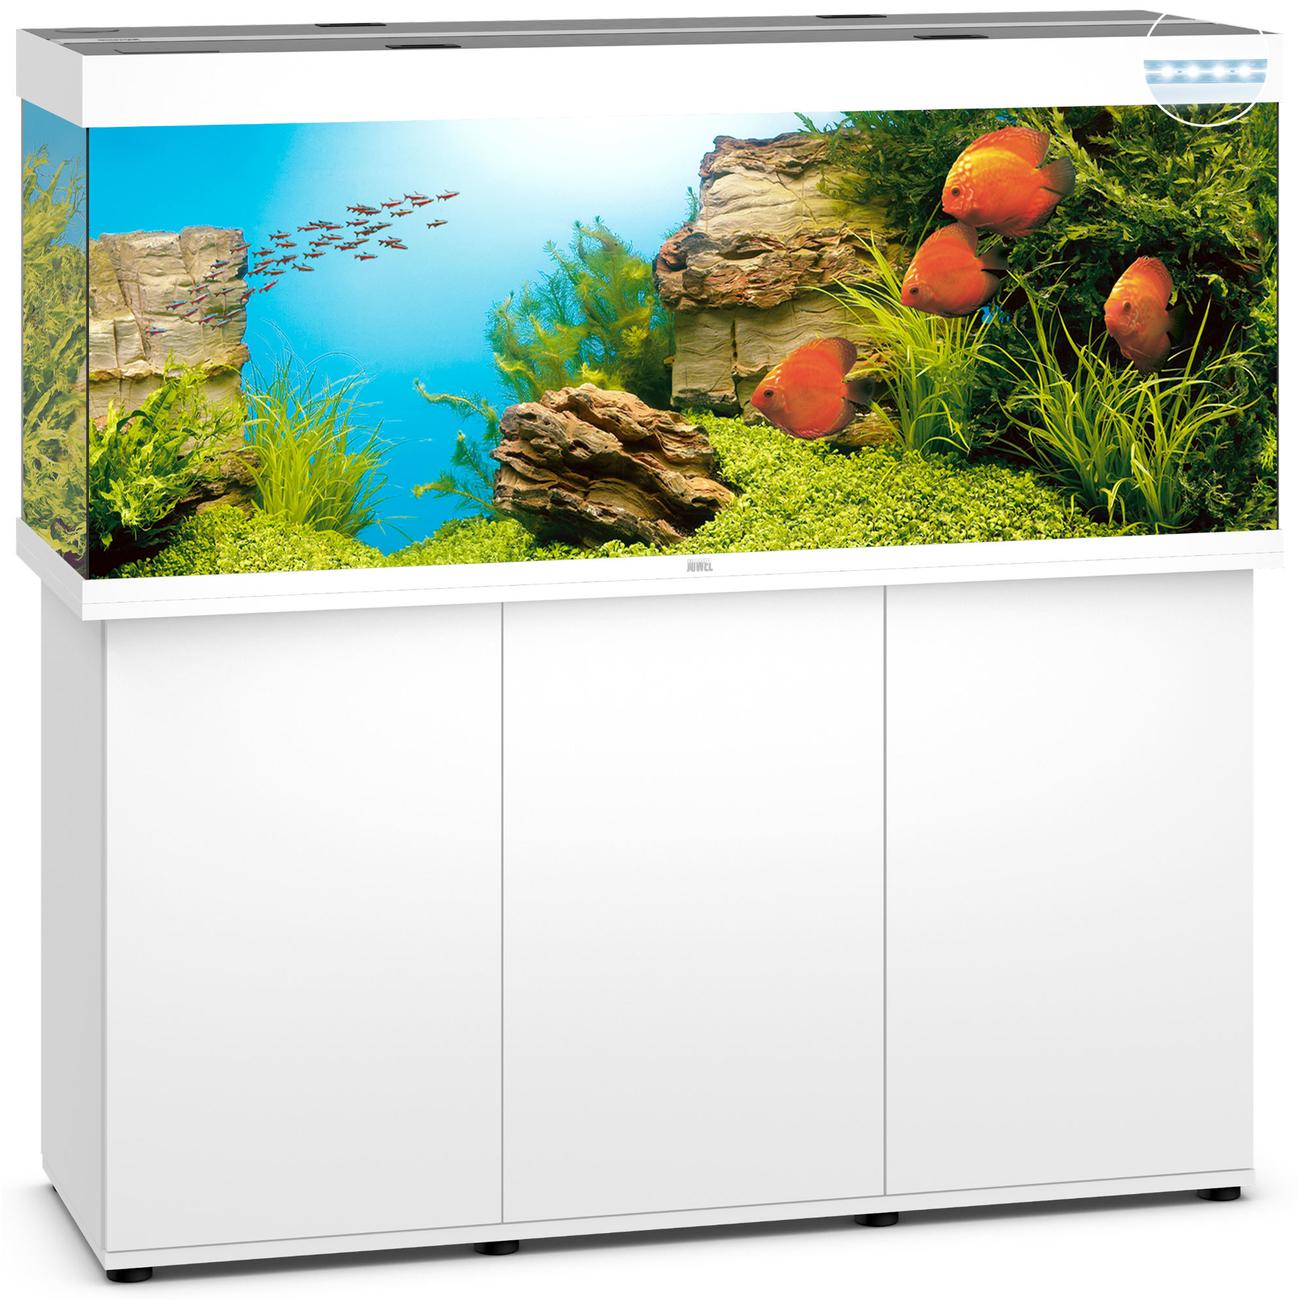 Juwel Rio 450 LED Aquarium mit Unterschrank, Bild 8